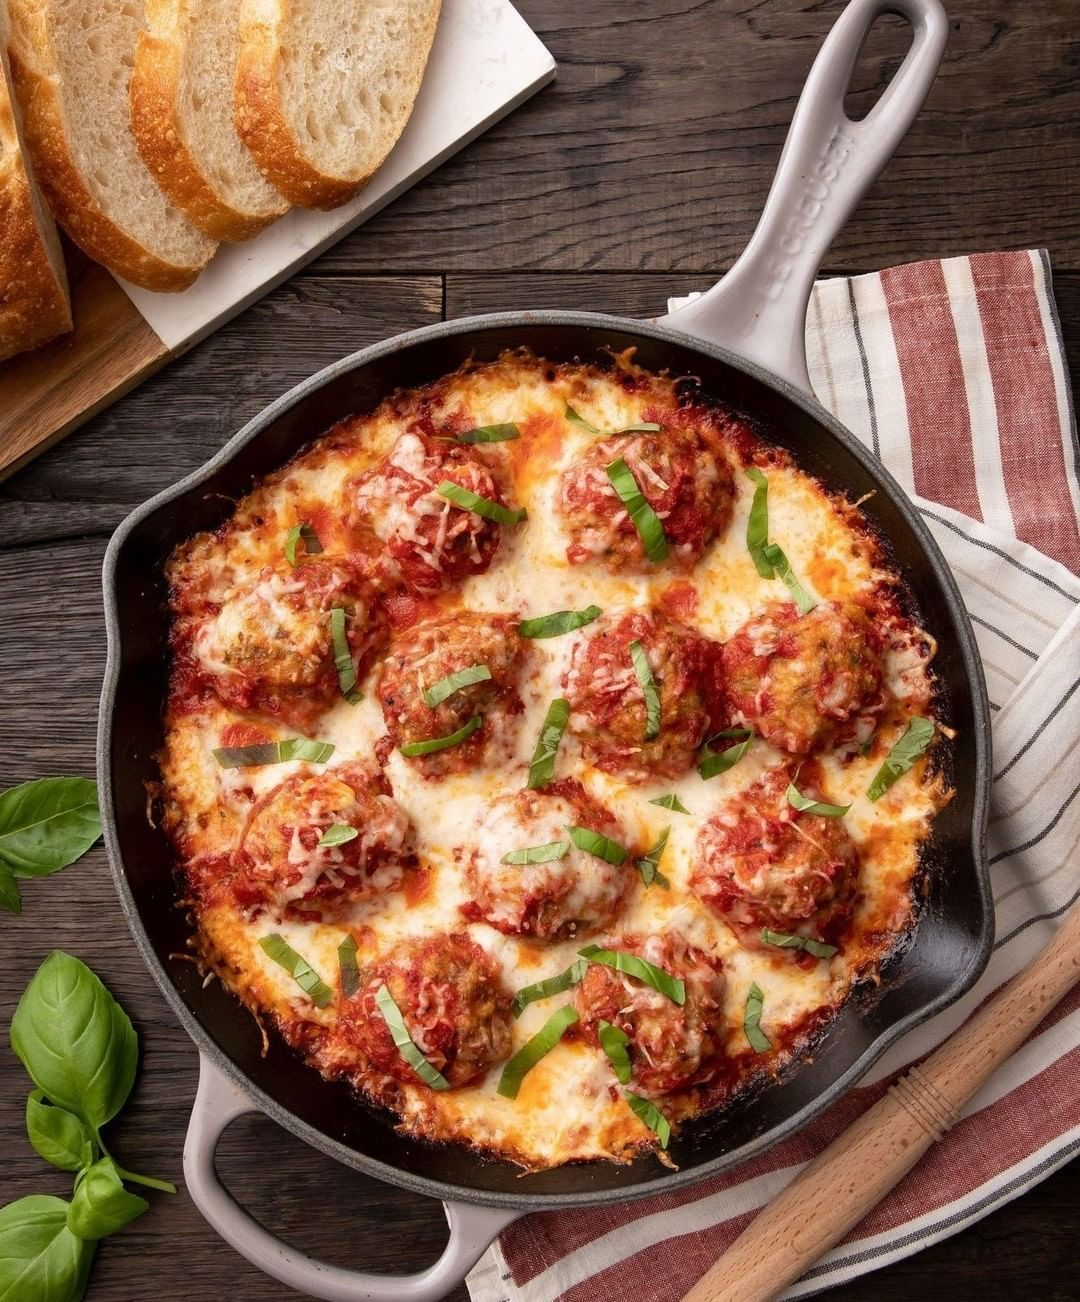 Le creuset on instagram winter comfort food at its best